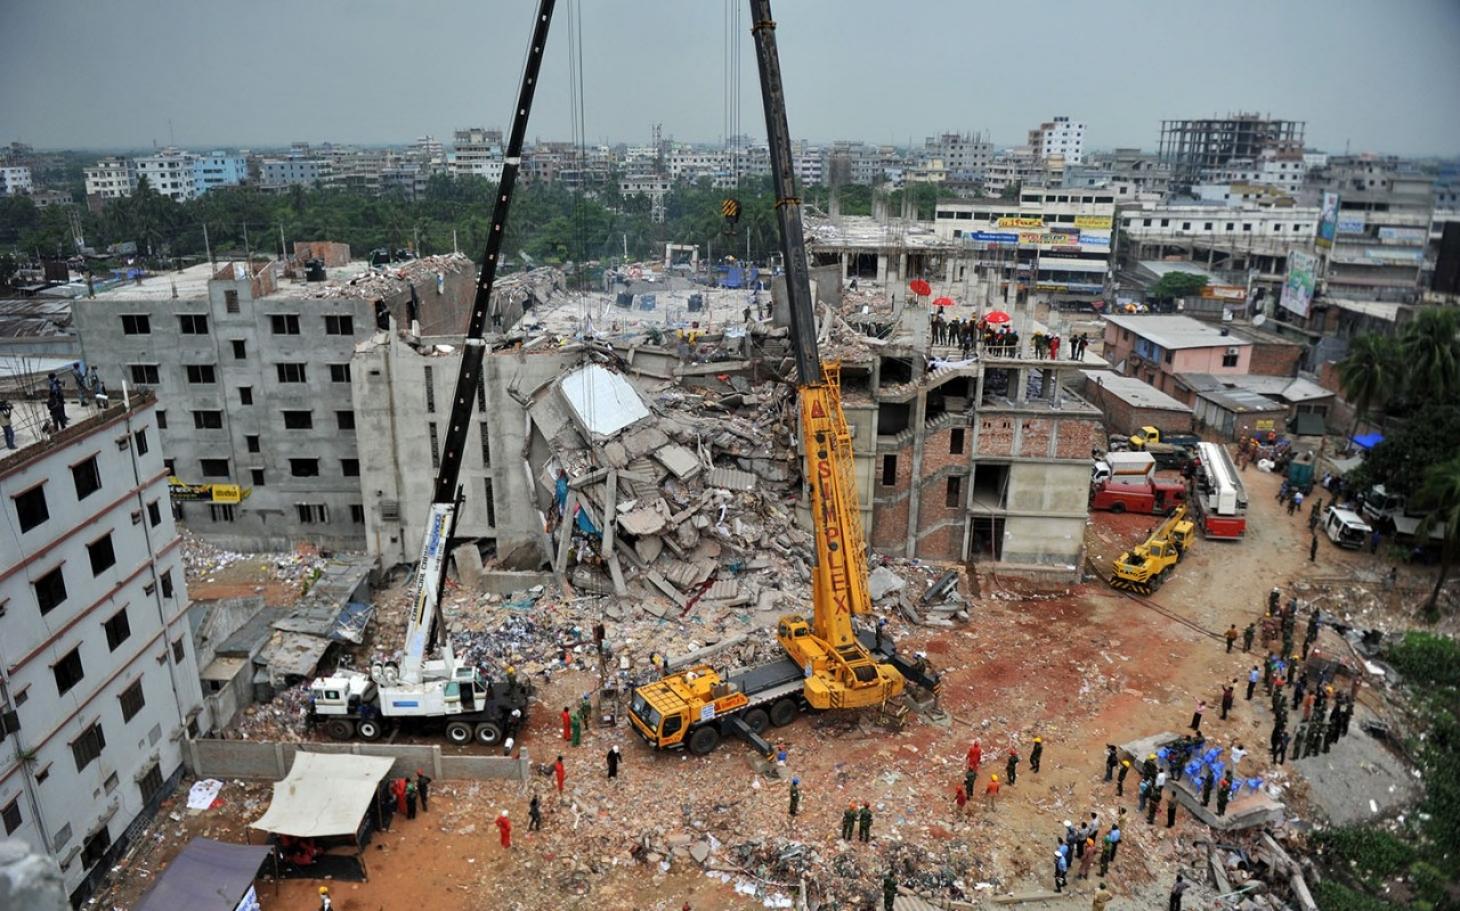 Murder Charges for Dhakka Garment Factory Chiefs | Al Jazeera America